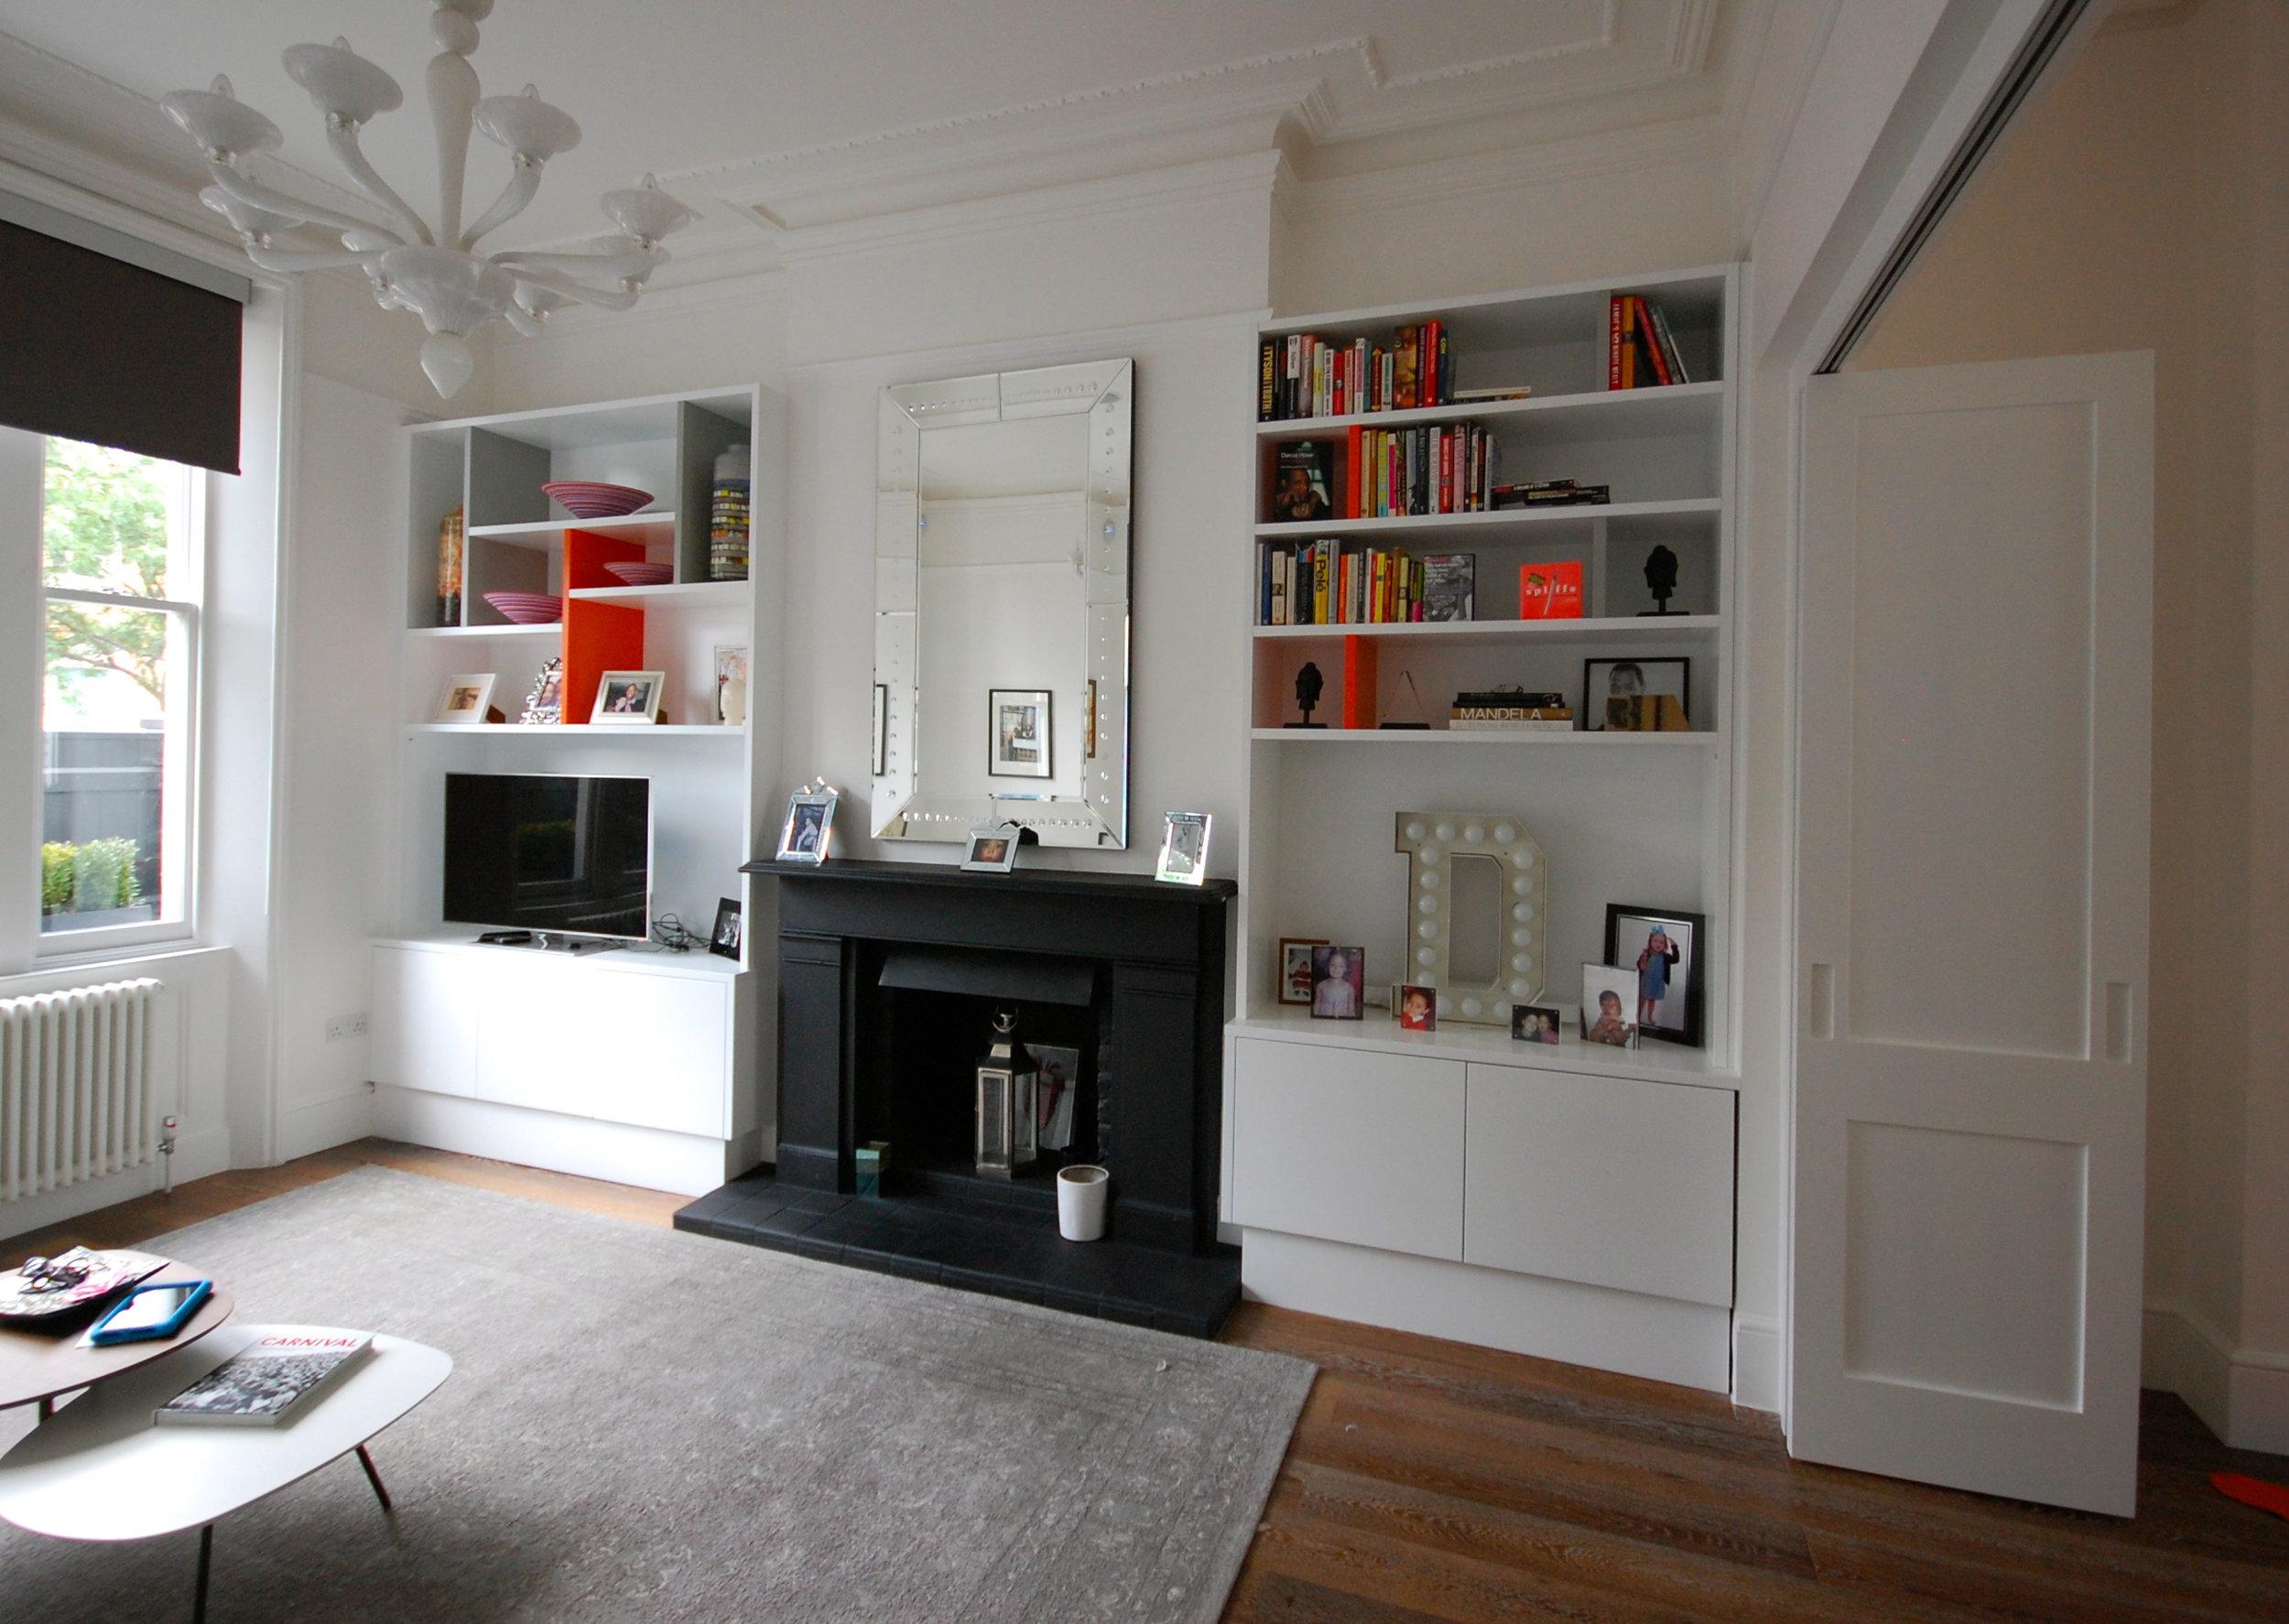 Grain_Bespoke_Furniture_White_Sprayed_Room_Divider_Sideboard_4.jpg